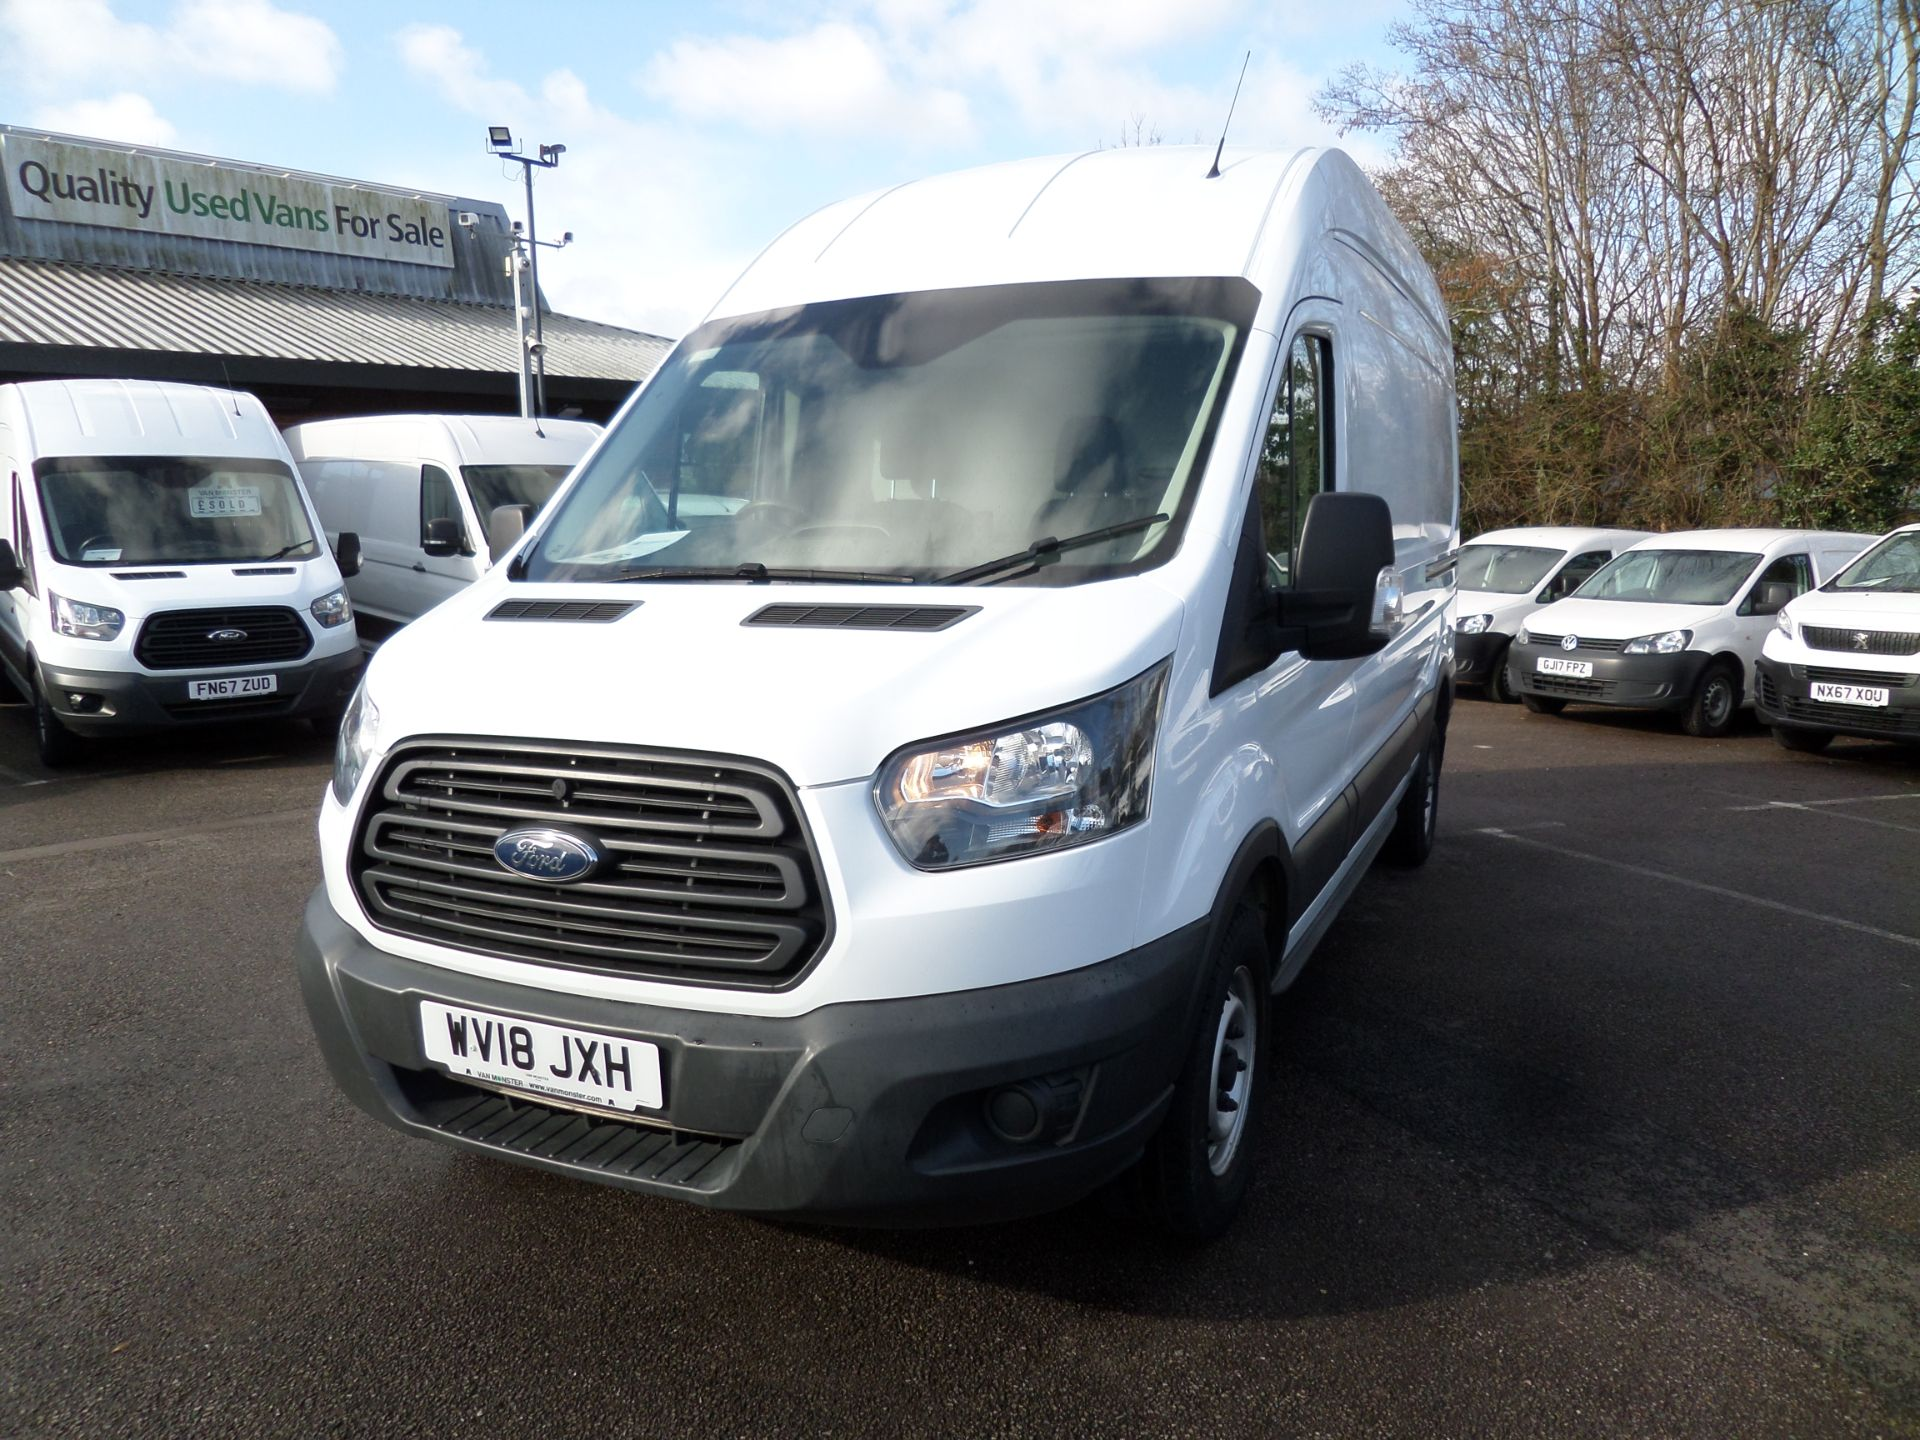 2018 Ford Transit 2.0 Tdci 130Ps H3 Van Euro 6 (WV18JXH) Image 9